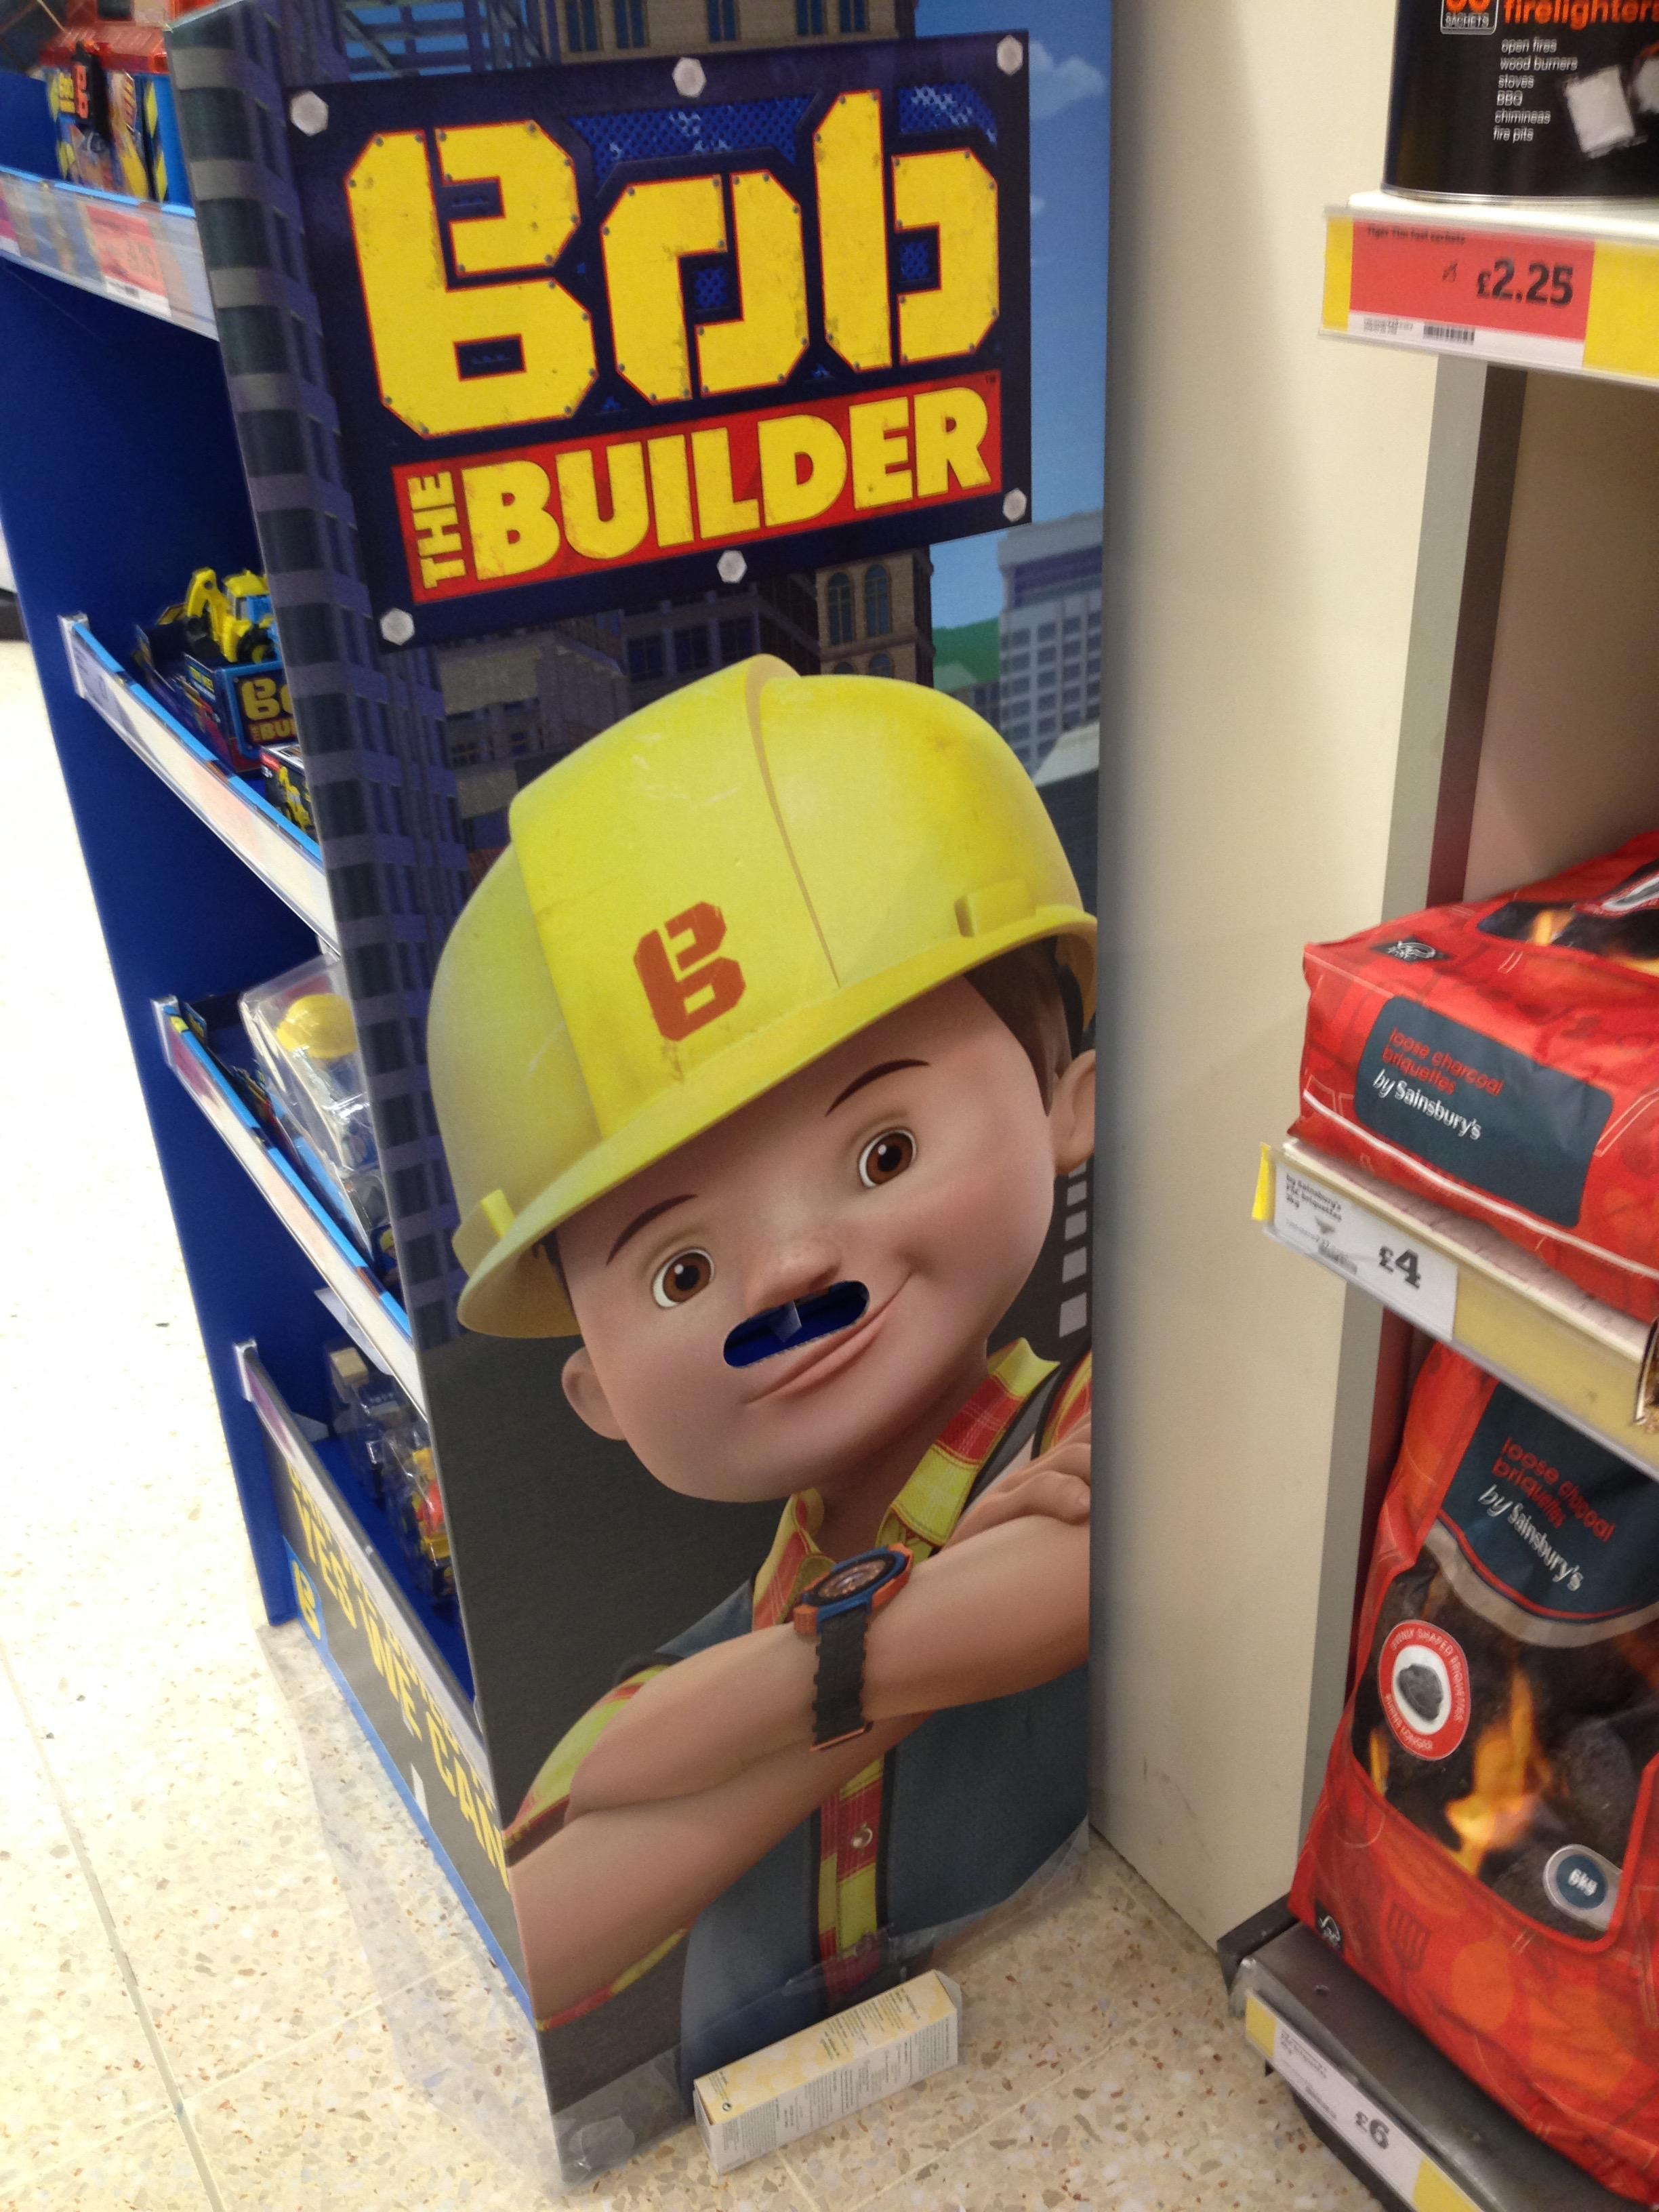 Bob The Builder Funny : builder, funny, Fuhrer, Funny